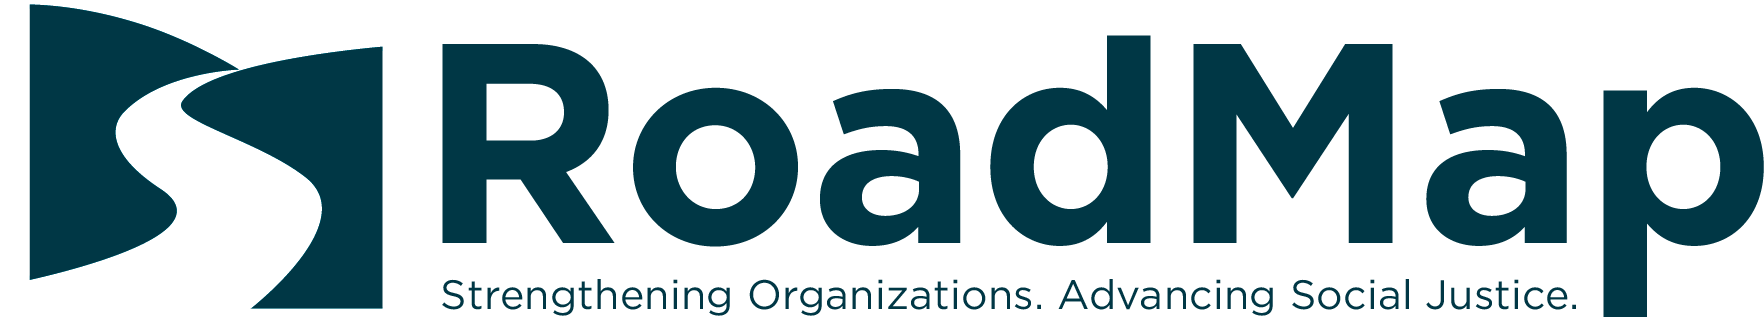 roadmap-logo-w-tagline.png